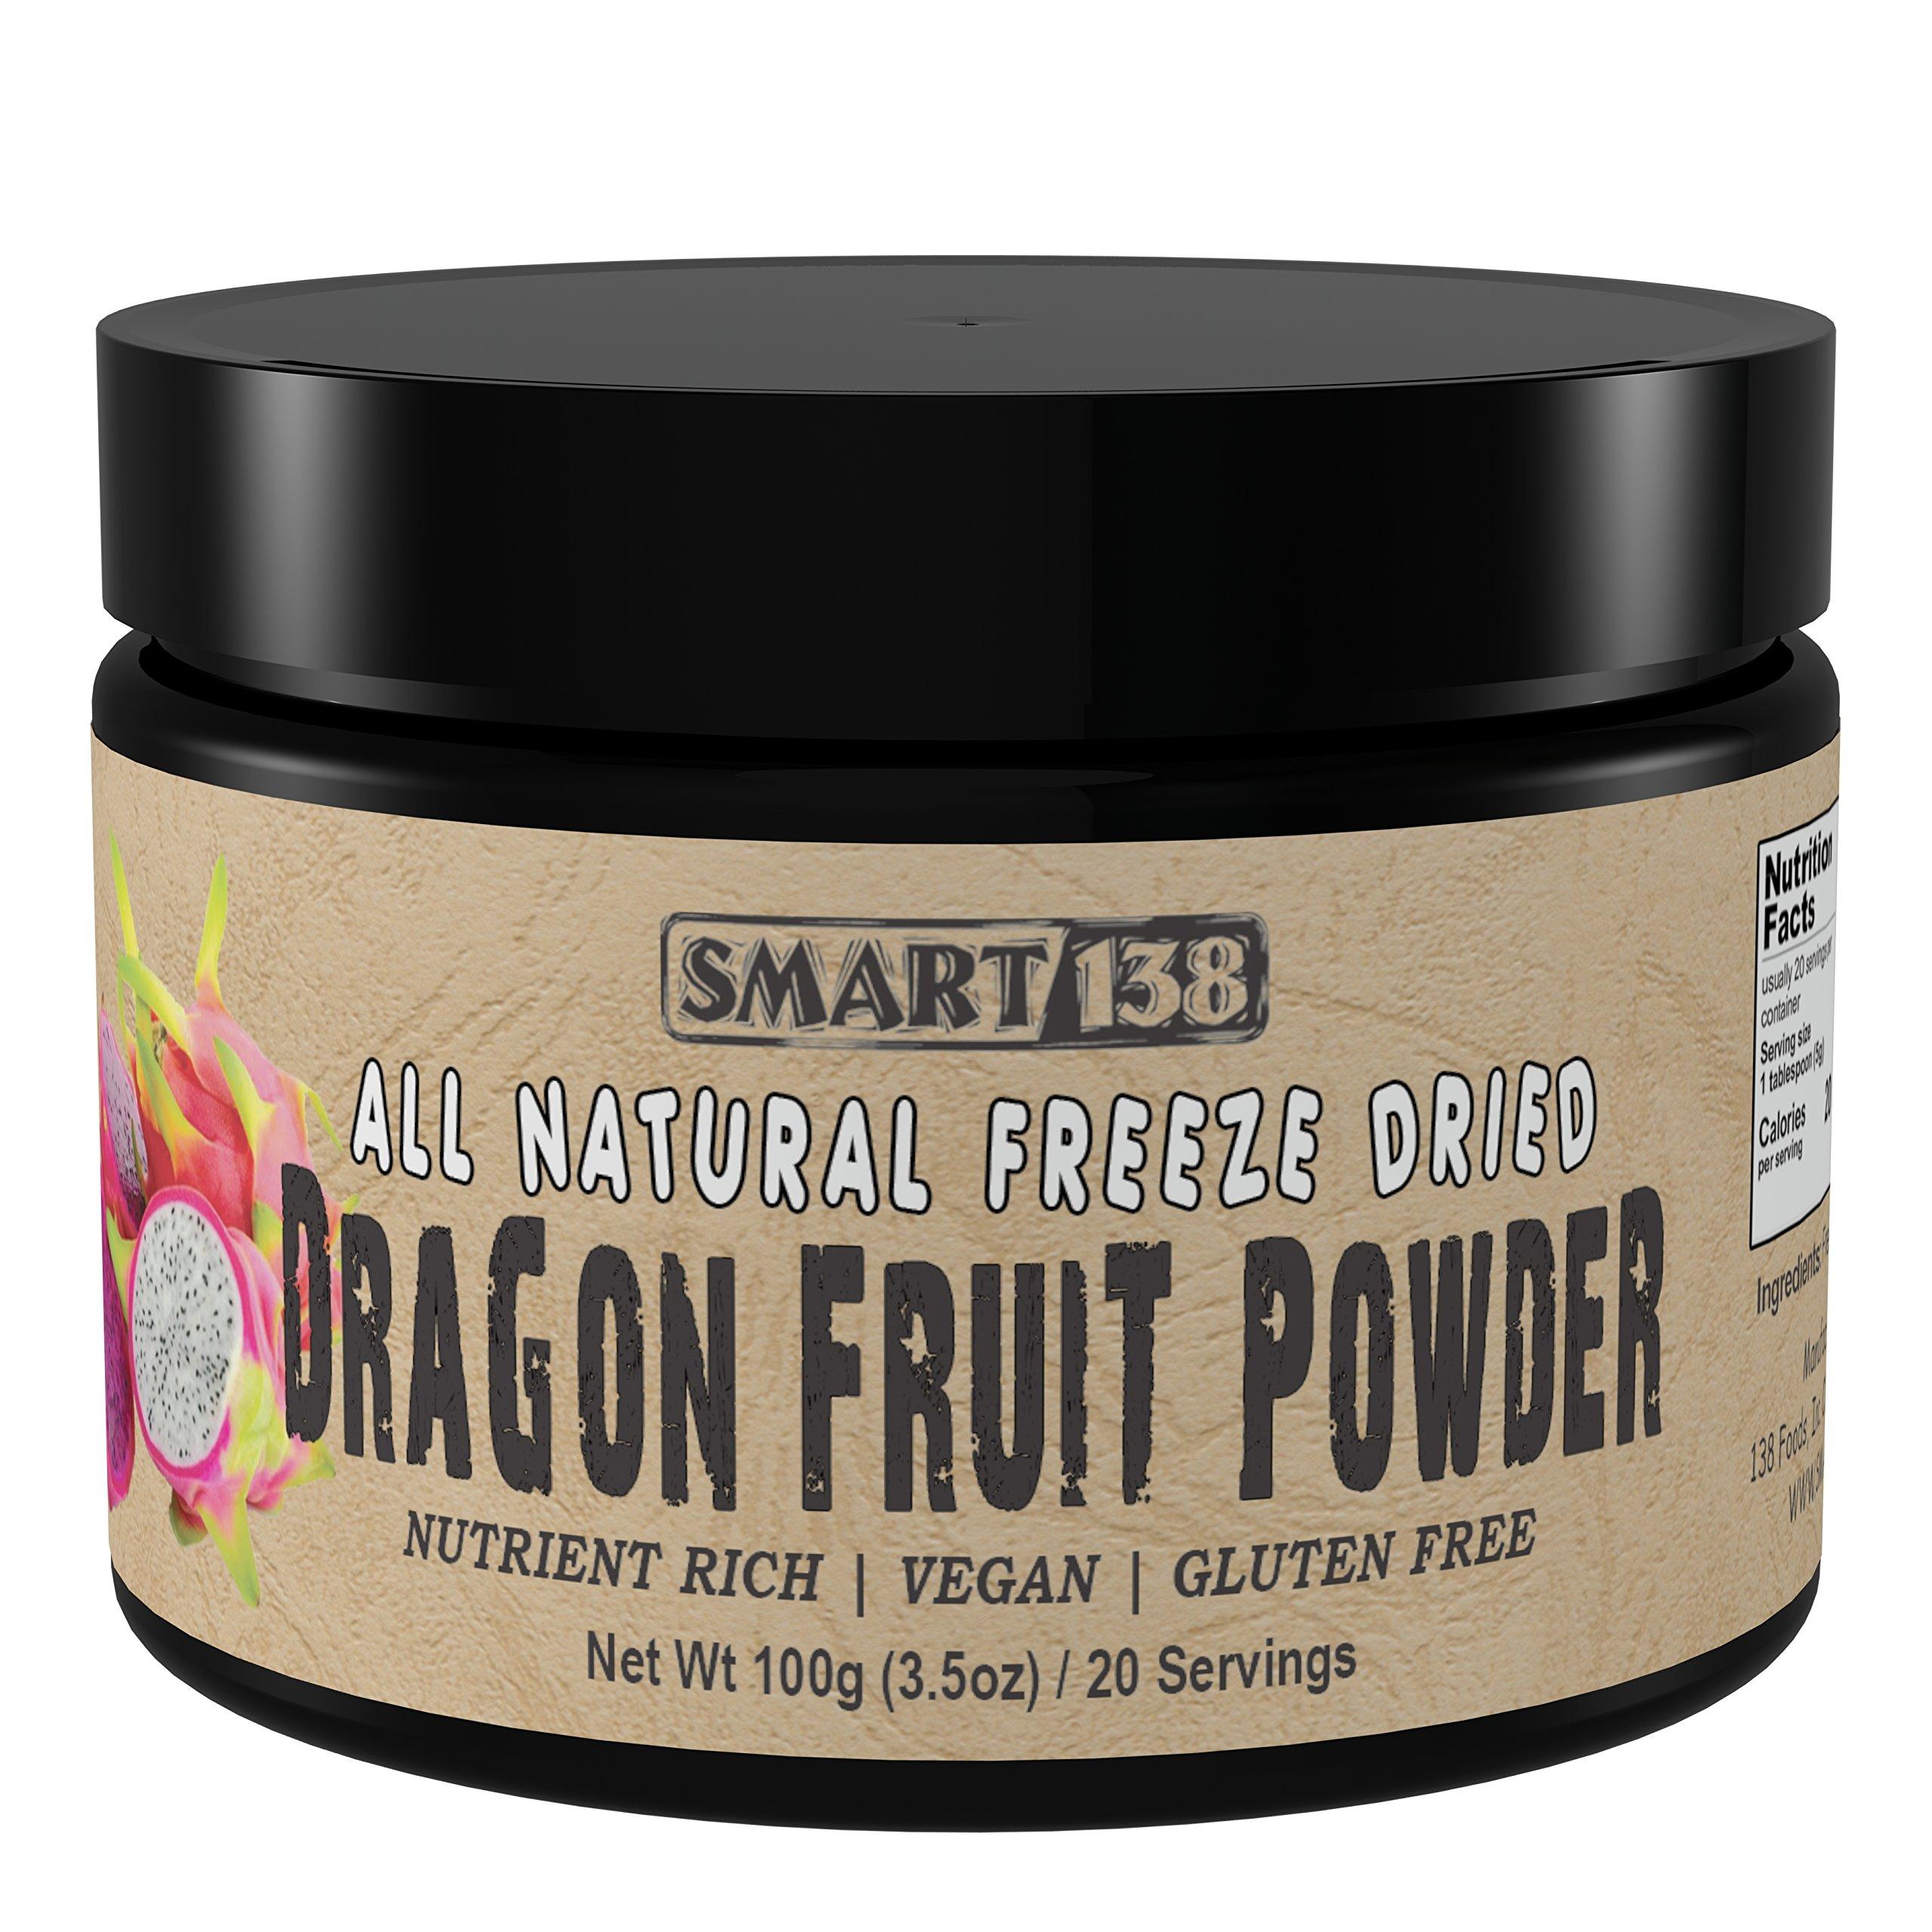 Dragon Fruit (Pitahaya) Powder, 100g / 3.5oz, Freeze Dried Purple, All Natural Dragonfruit, BPA-Free